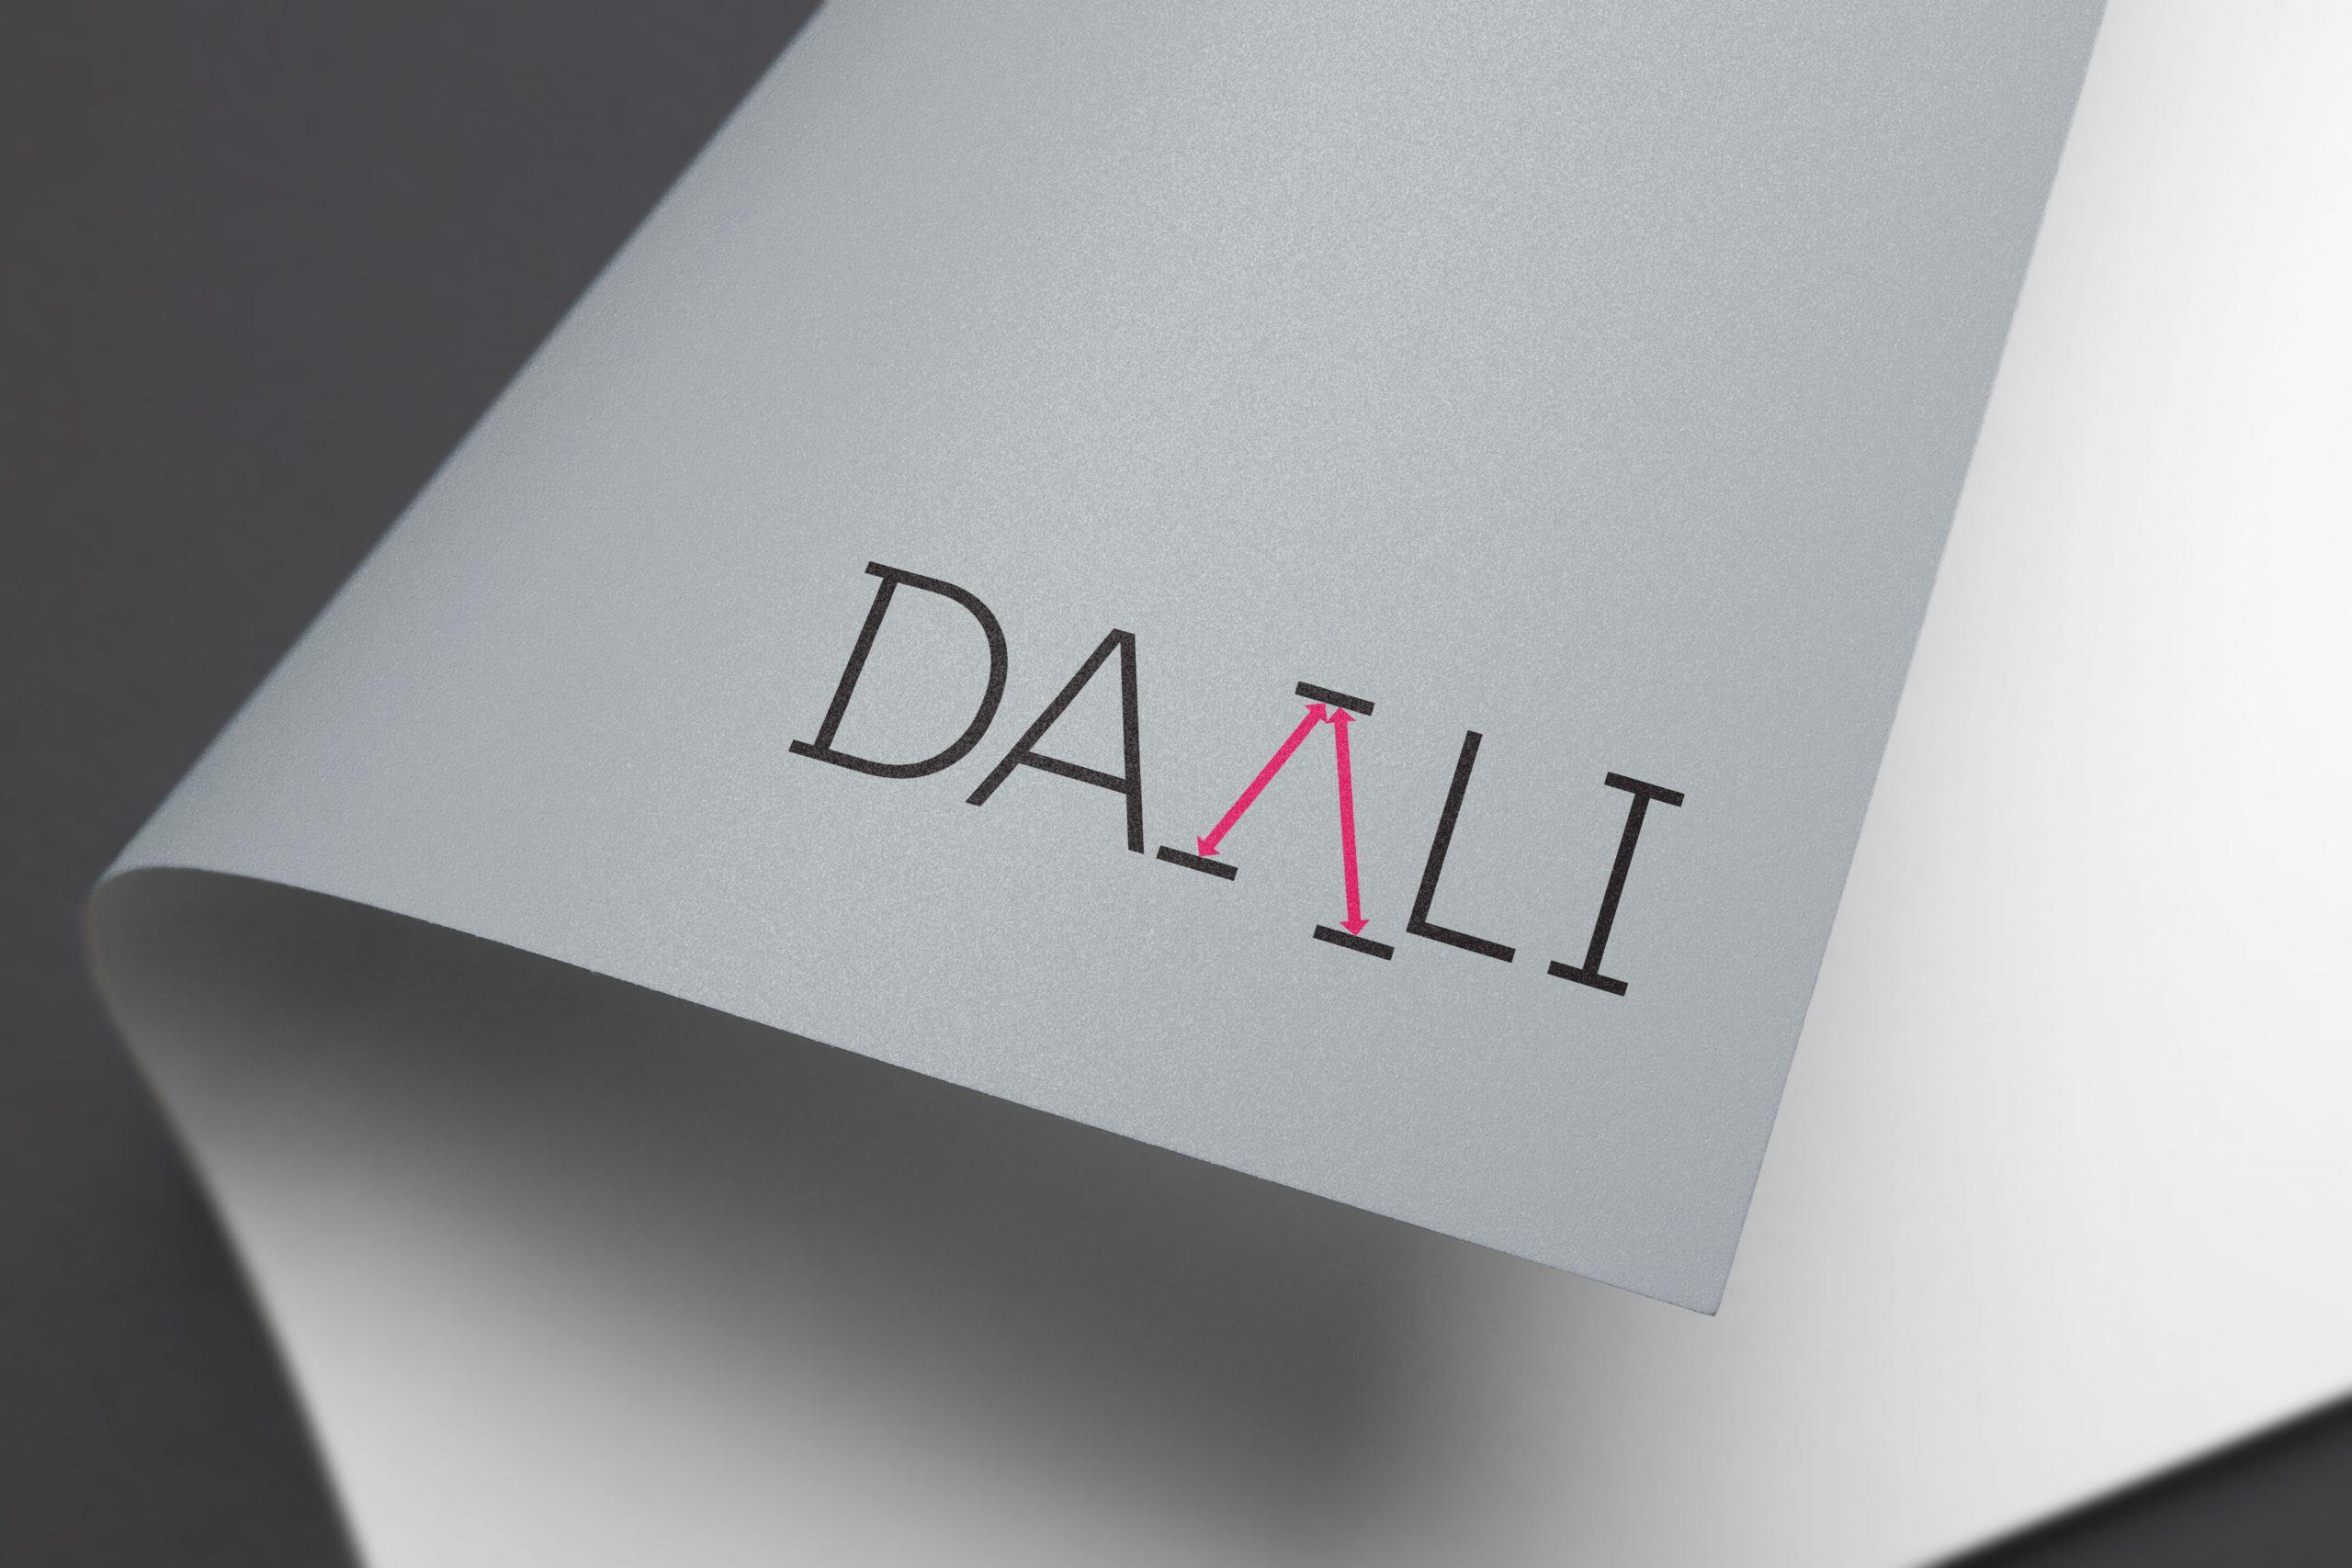 ICFO-poster-DAALI-Daniel-Cavalcanti-1